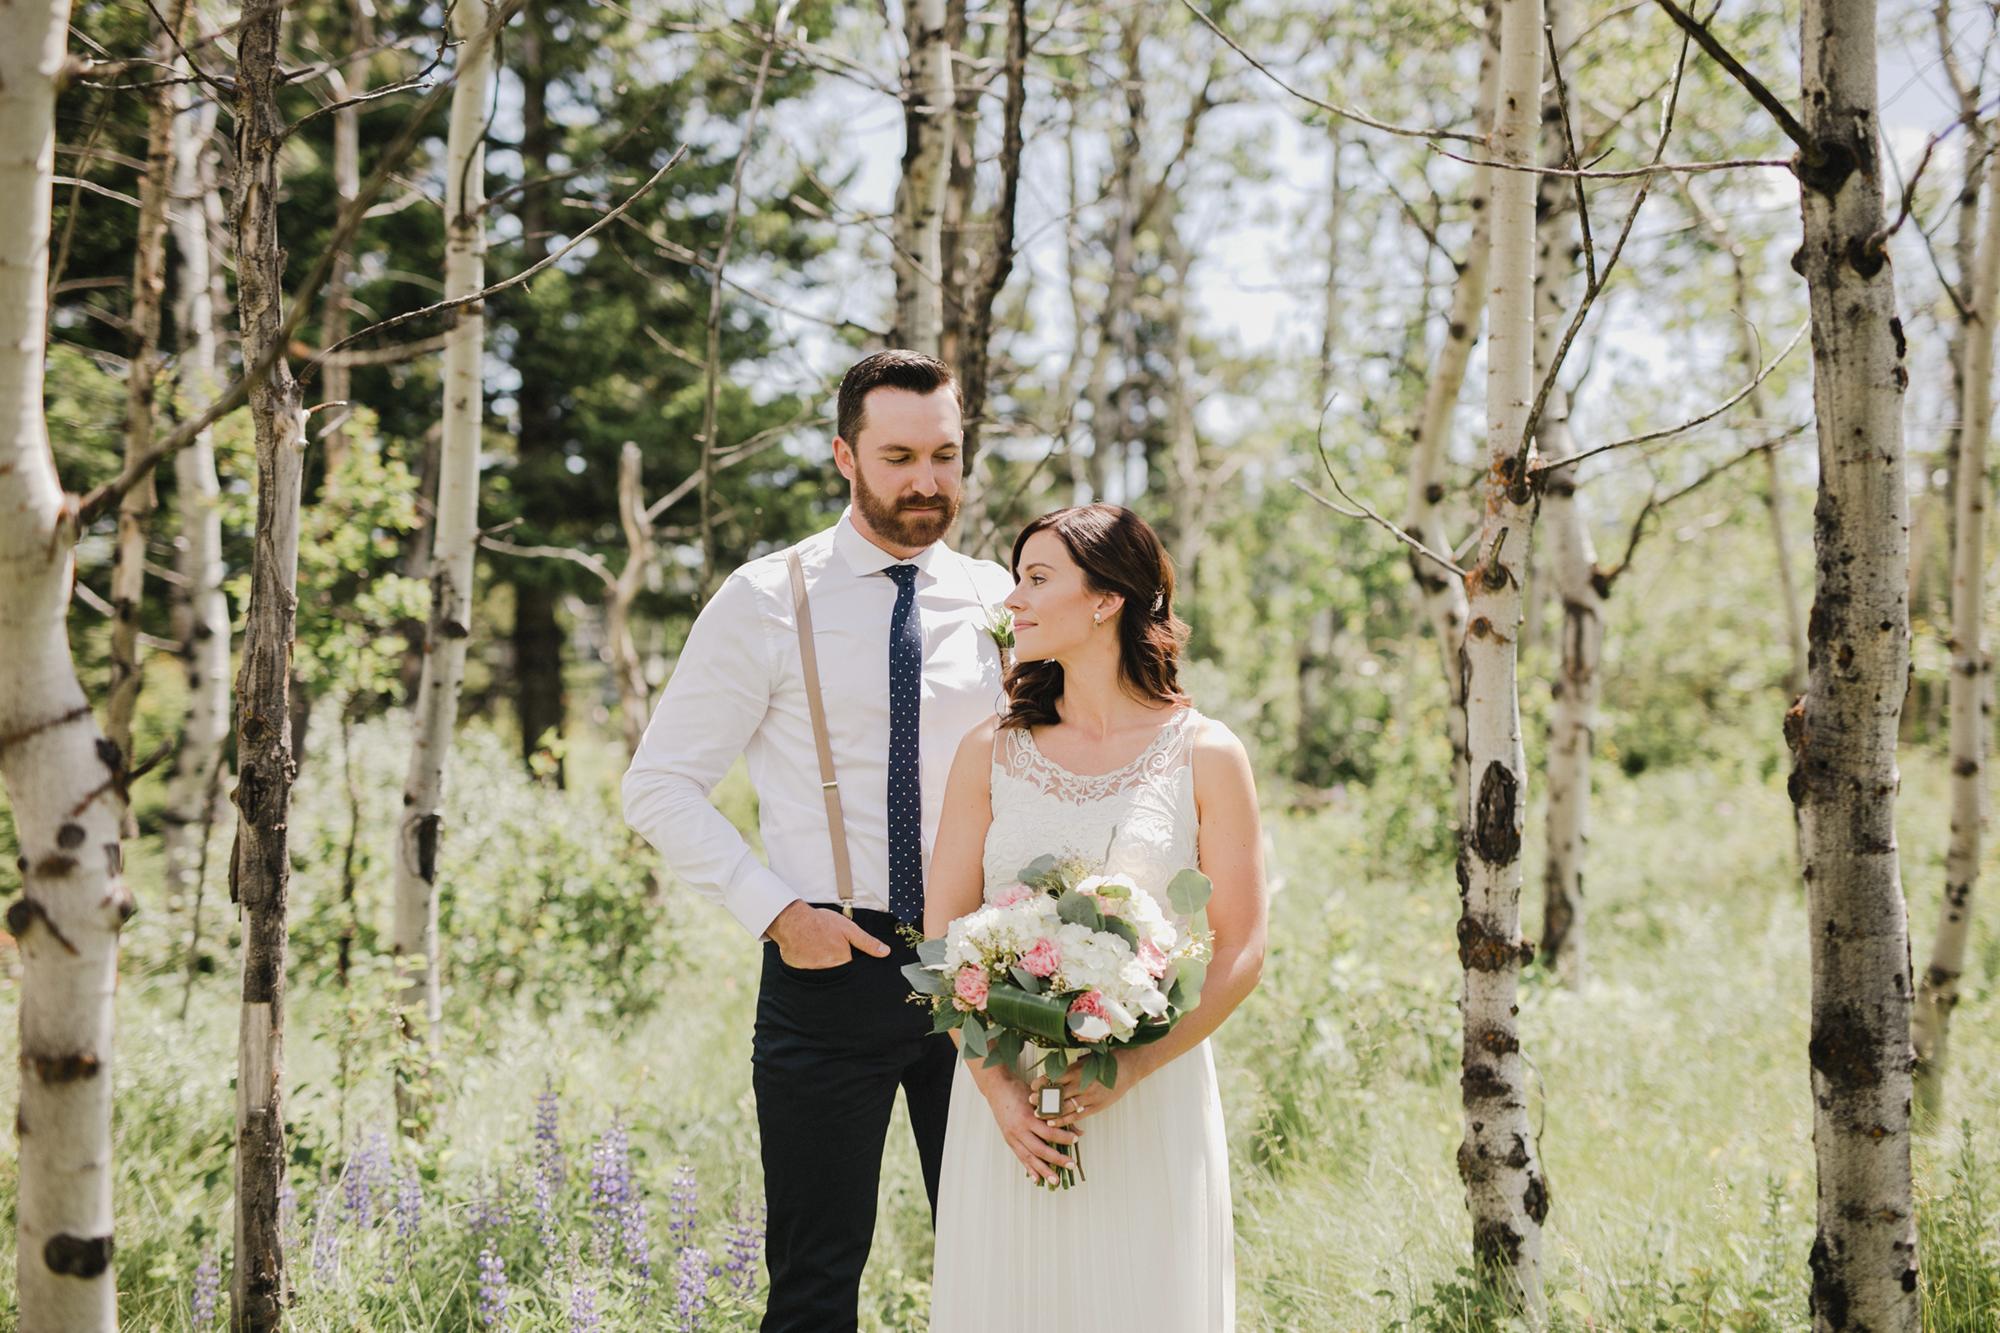 Flower Farm Crowsnest Pass Wedding -033.JPG